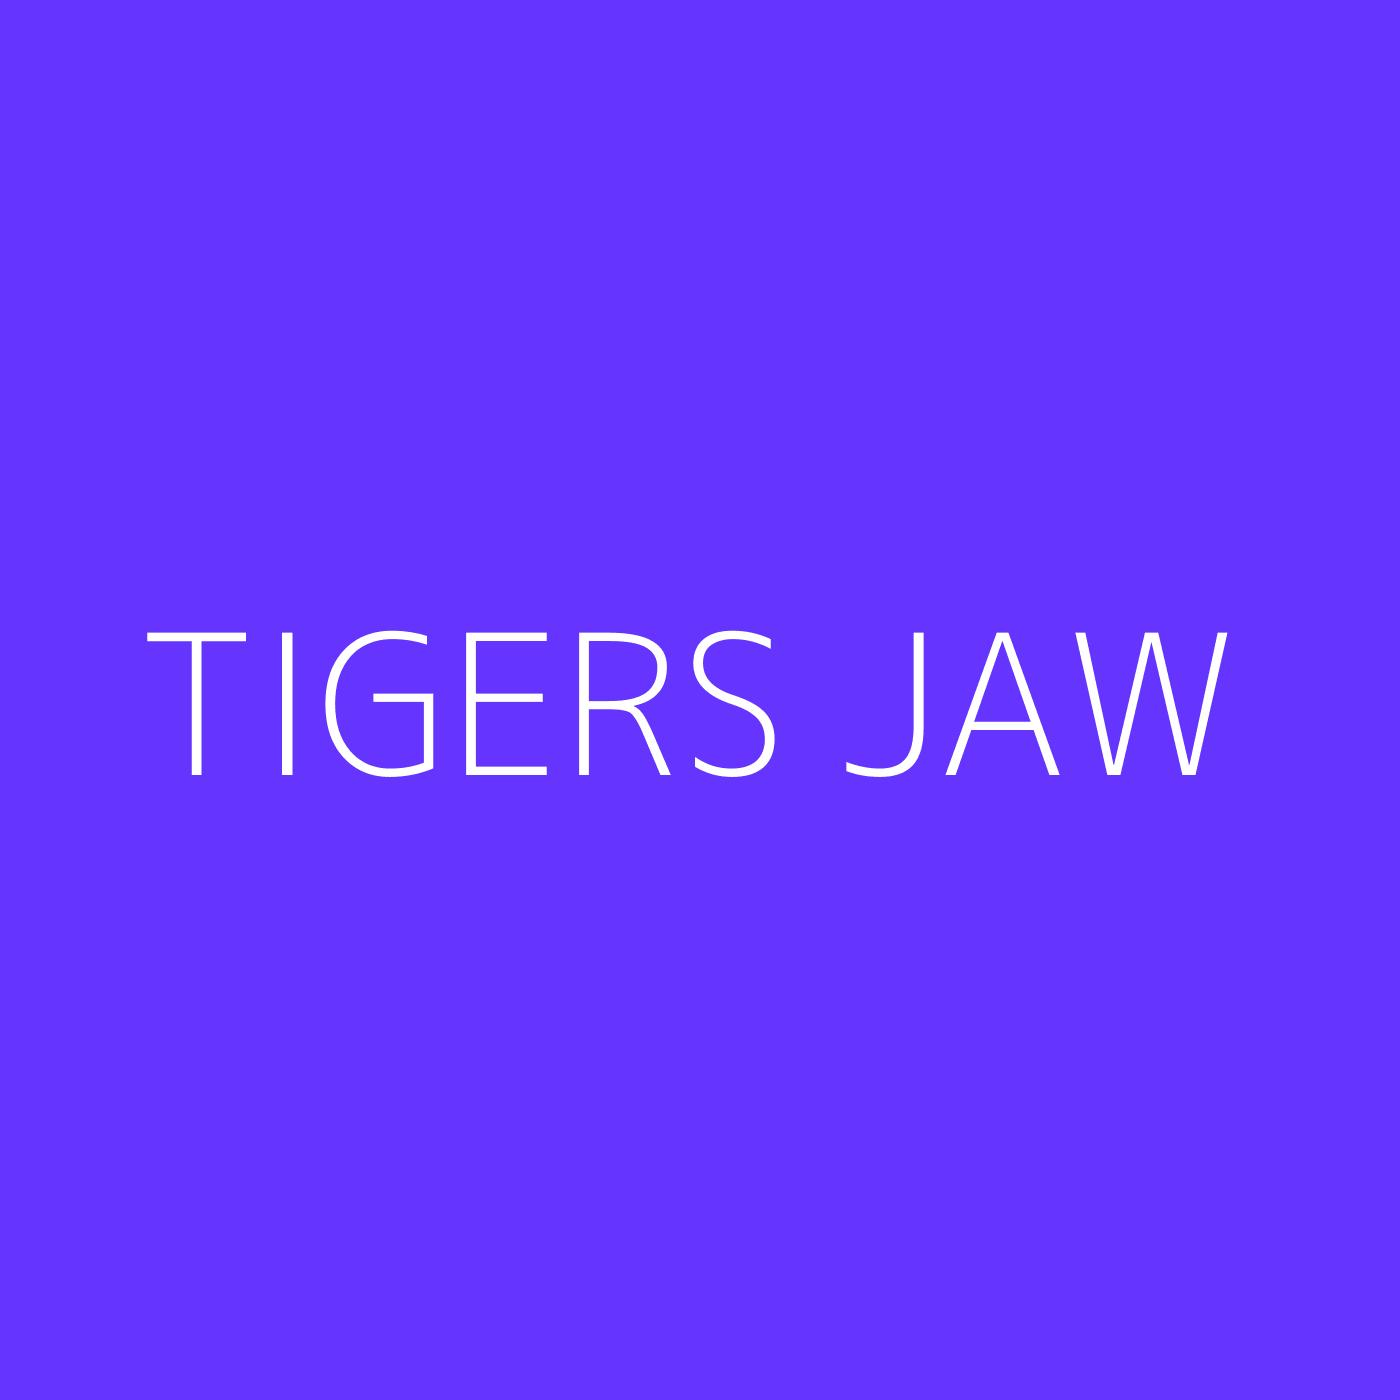 Tigers Jaw Playlist Artwork